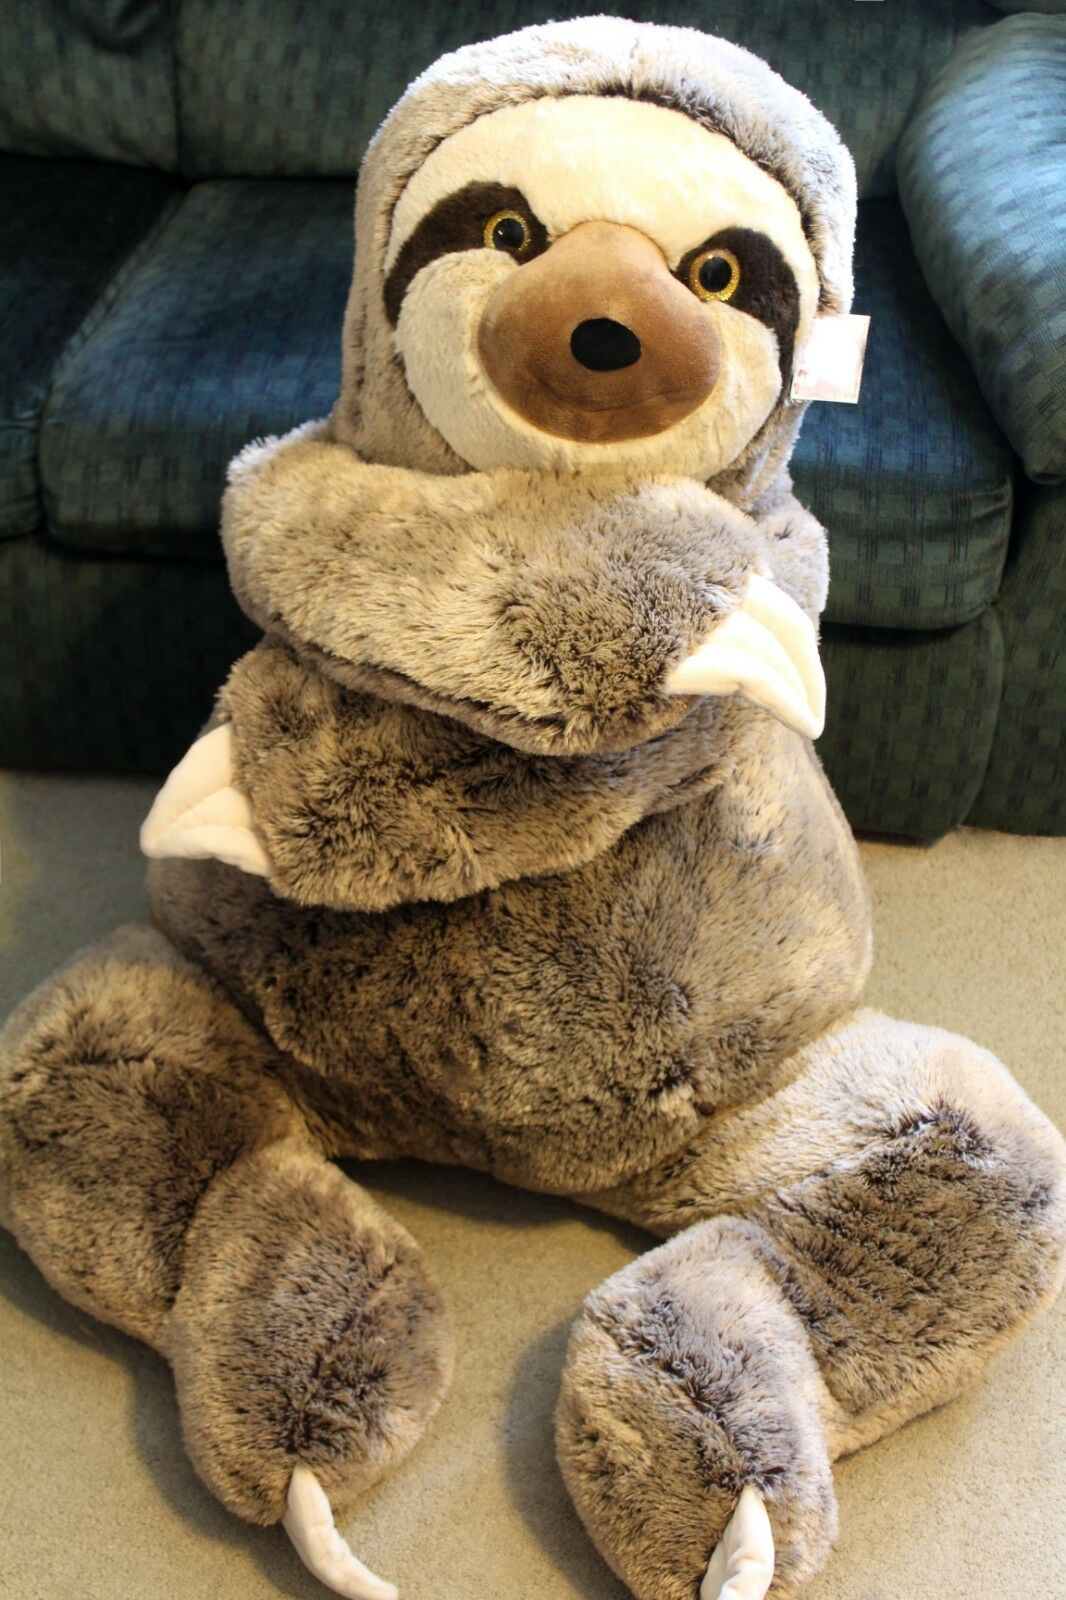 jumbo sloth plush 4 feet tall x large stuffed animal huge big giant xl buddy new